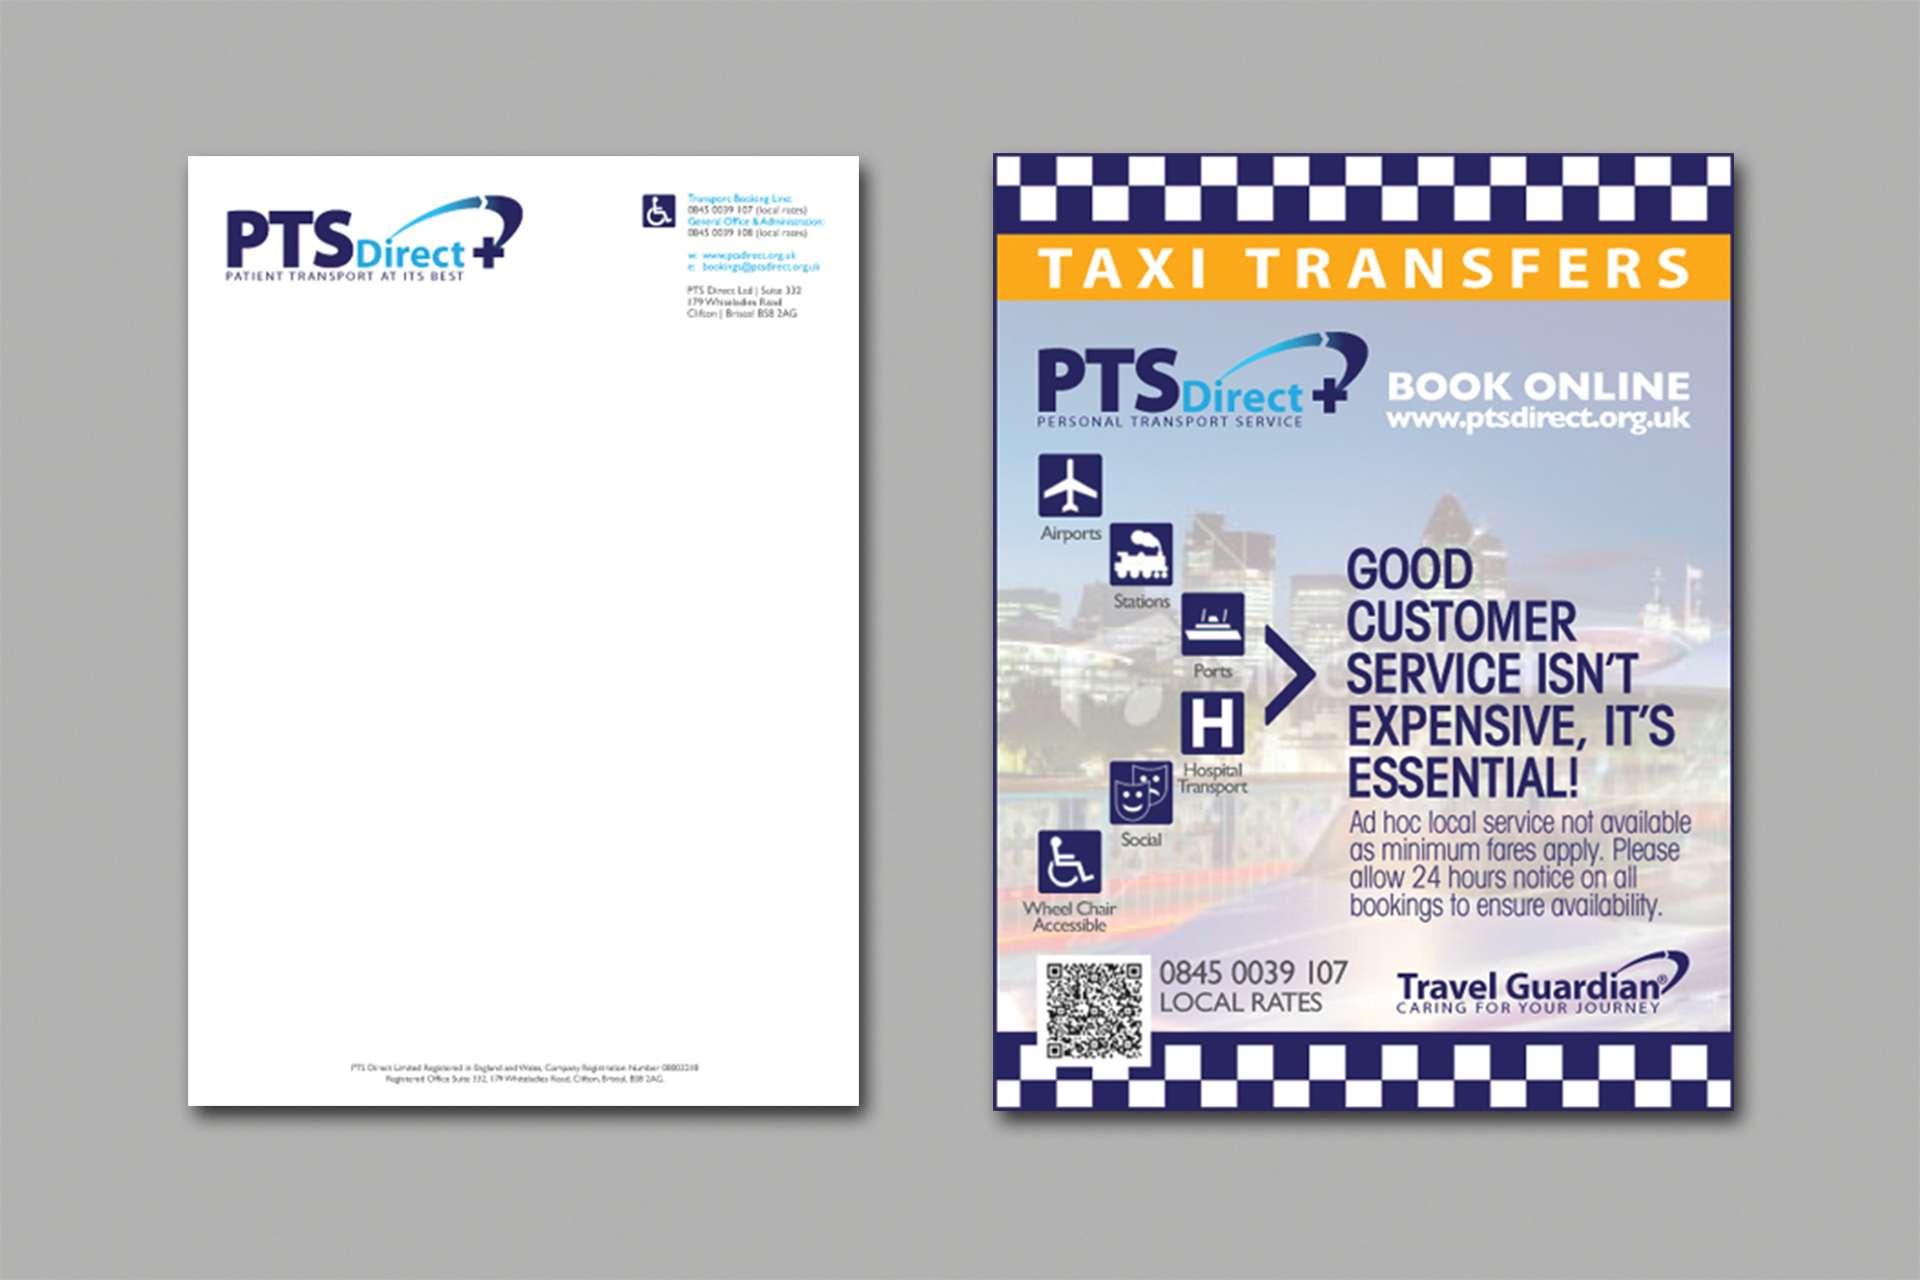 Pts direct branding logos clifton bristol the design hive logo design clifton reheart Images